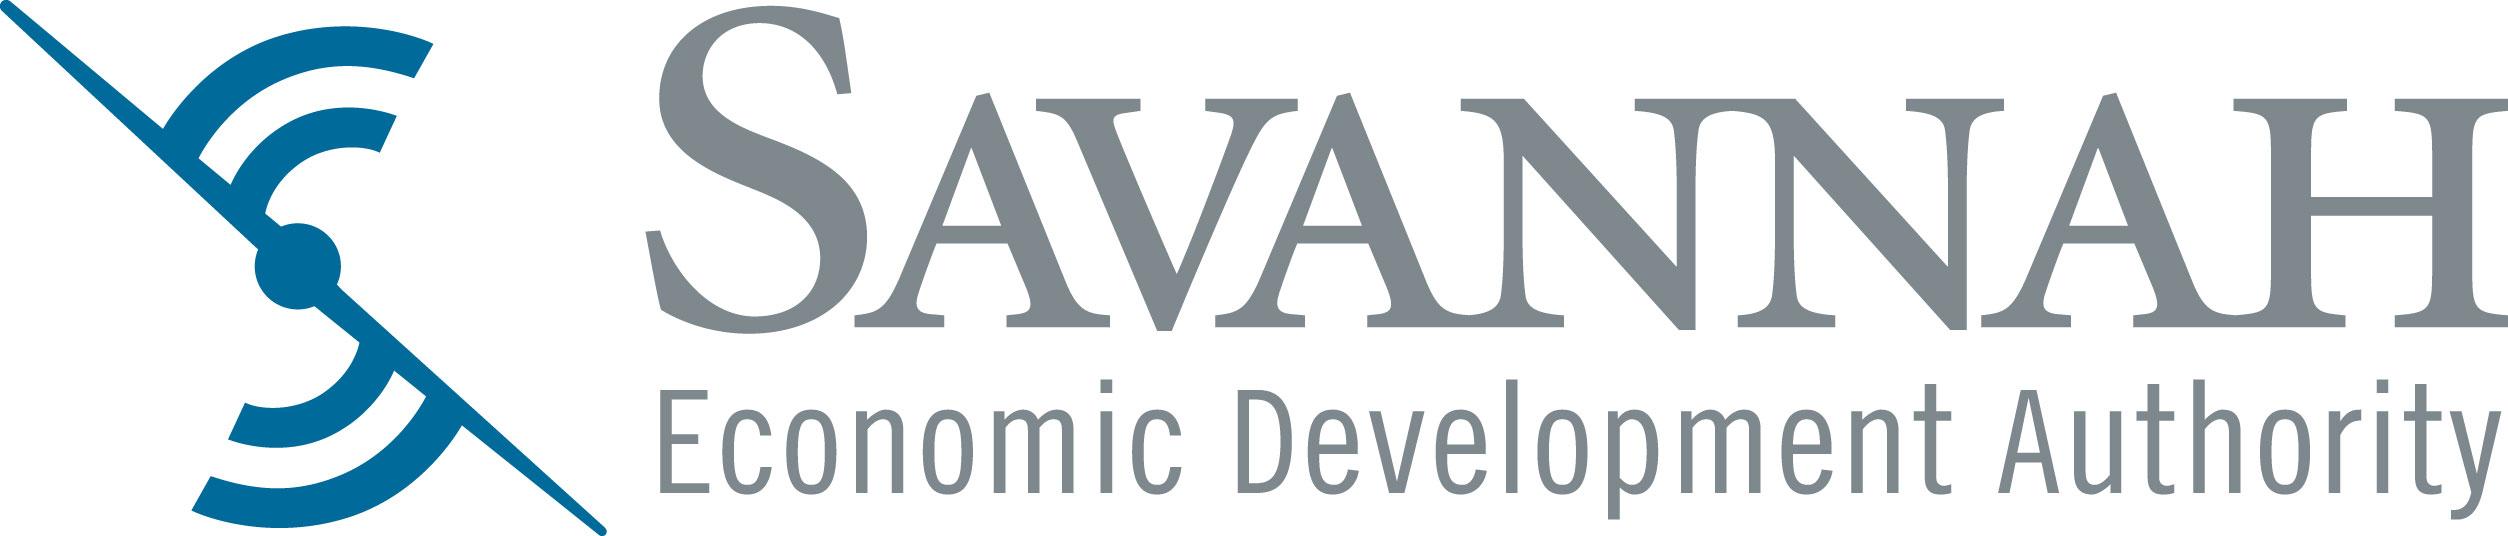 Savannah-Economic-Dev.-Authority-logo--Breakfast